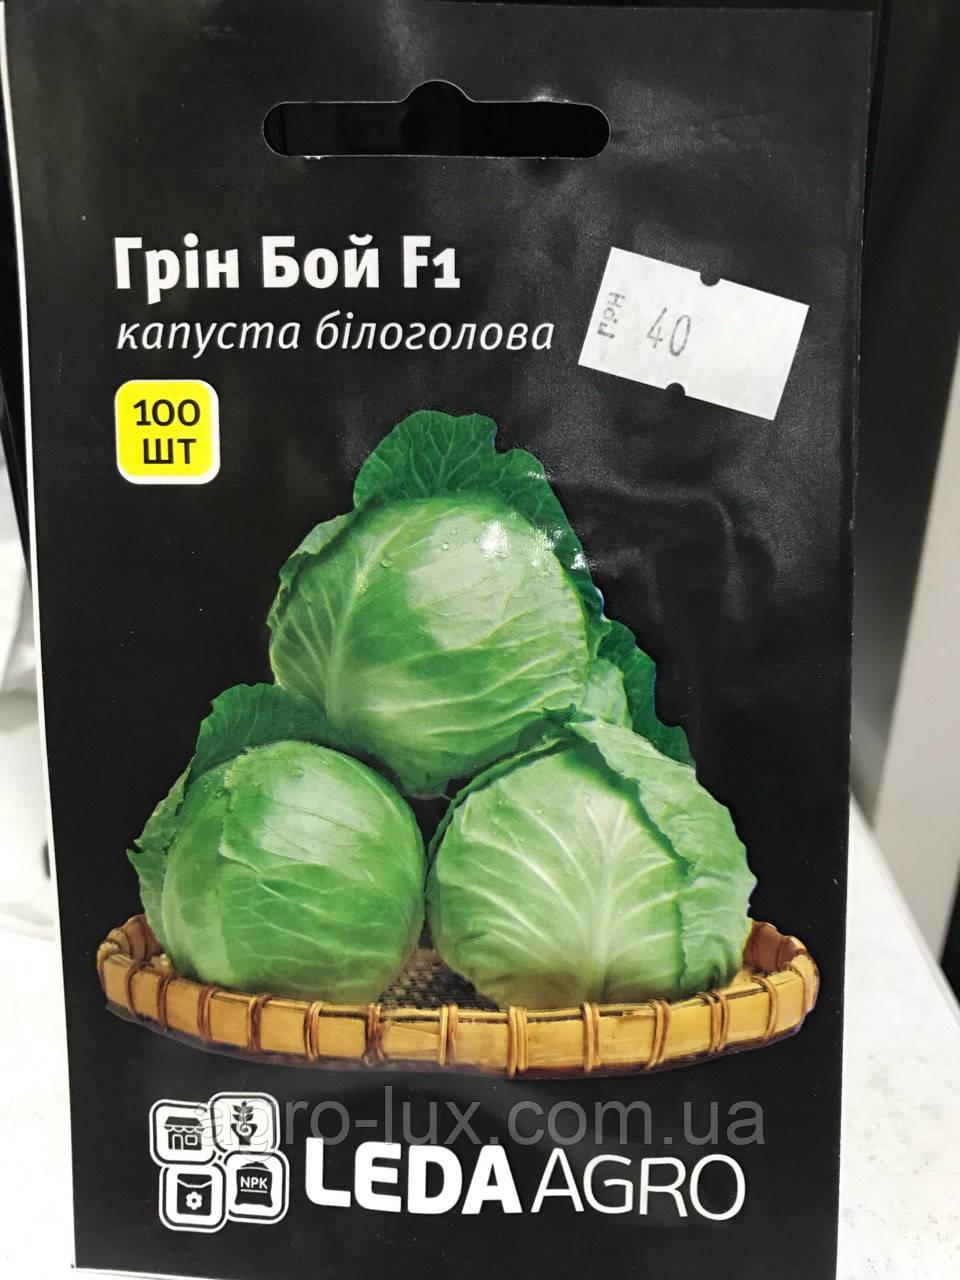 Семена капусты б/к Грин бой F1 100 шт